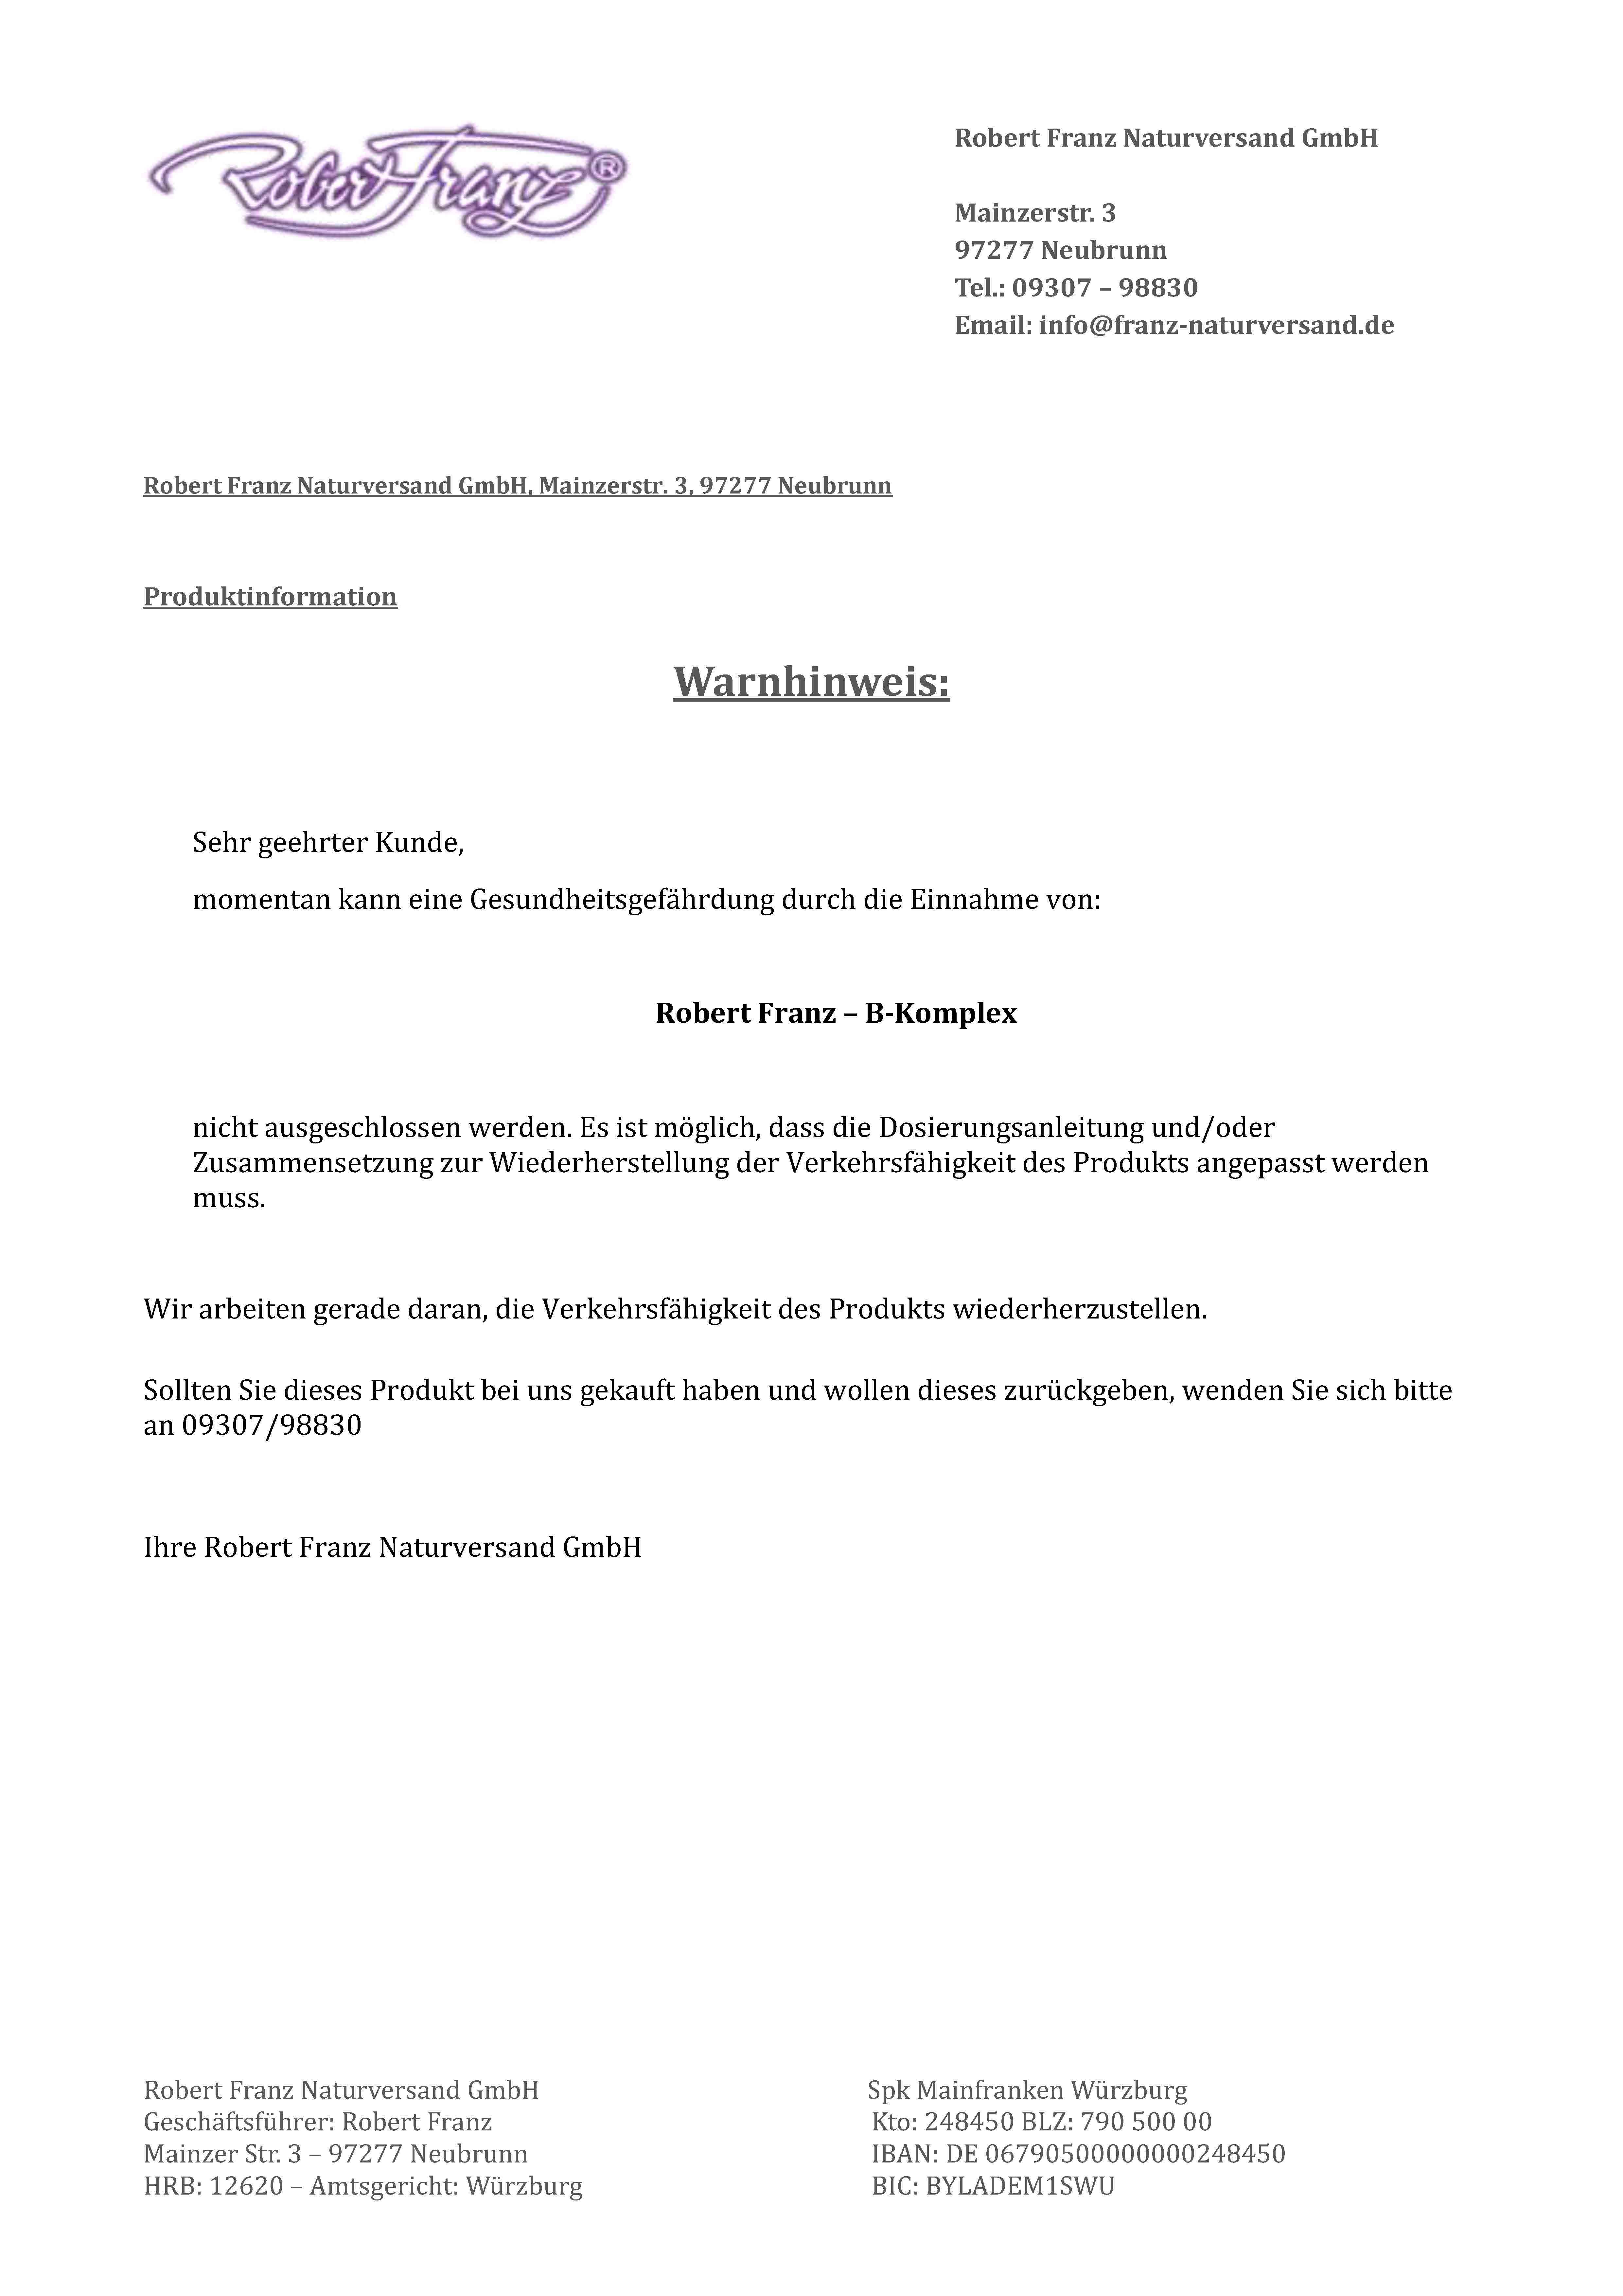 3bac2c289132d5 Rückruf  Behörde warnt vor Nahrungsergänzungsmittel der Robert Franz ...